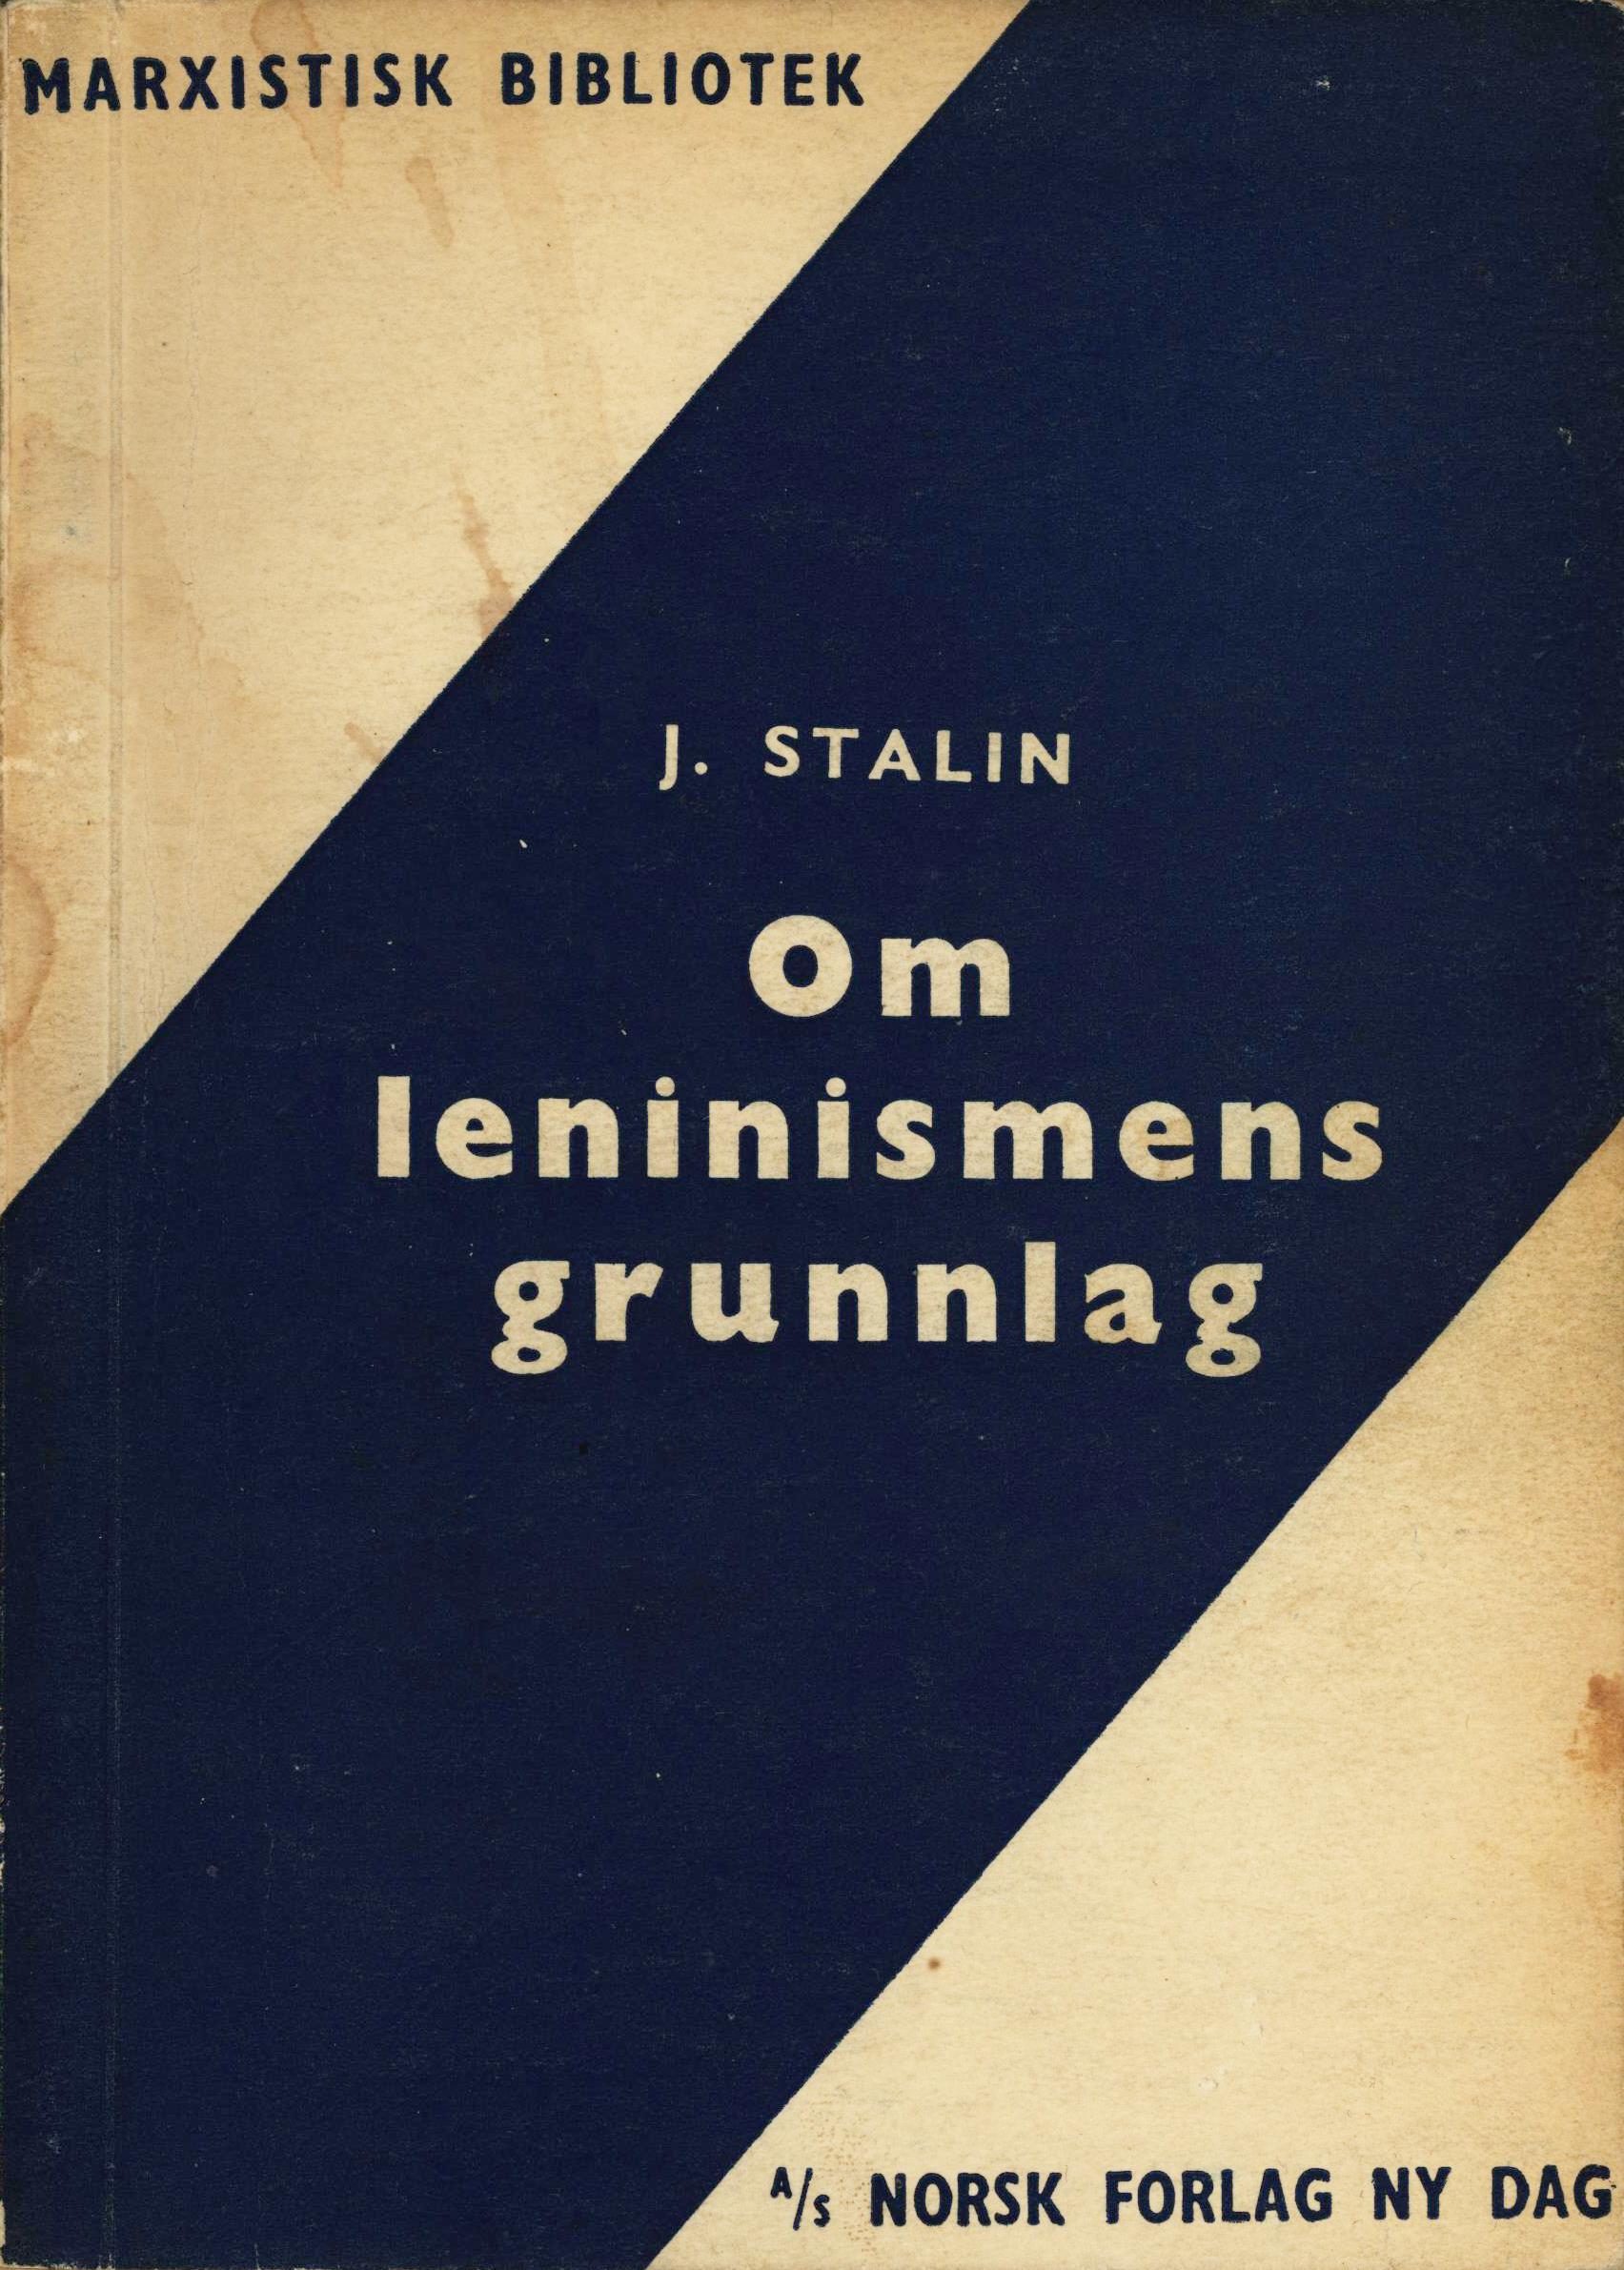 Josef Stalin: Om leninismens grunnlag